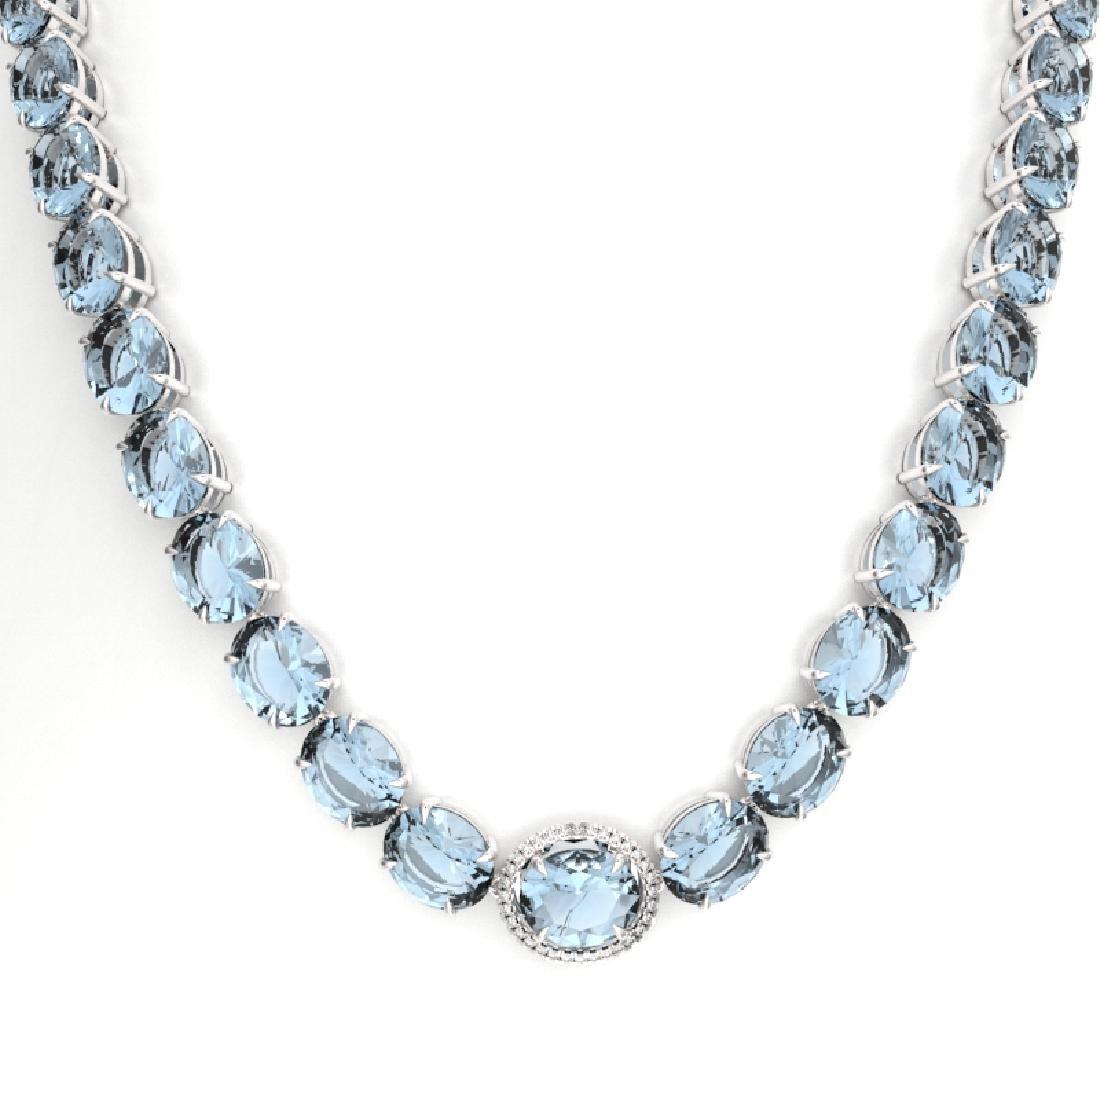 136 CTW Aquamarine & VS/SI Diamond Necklace 14K White - 2